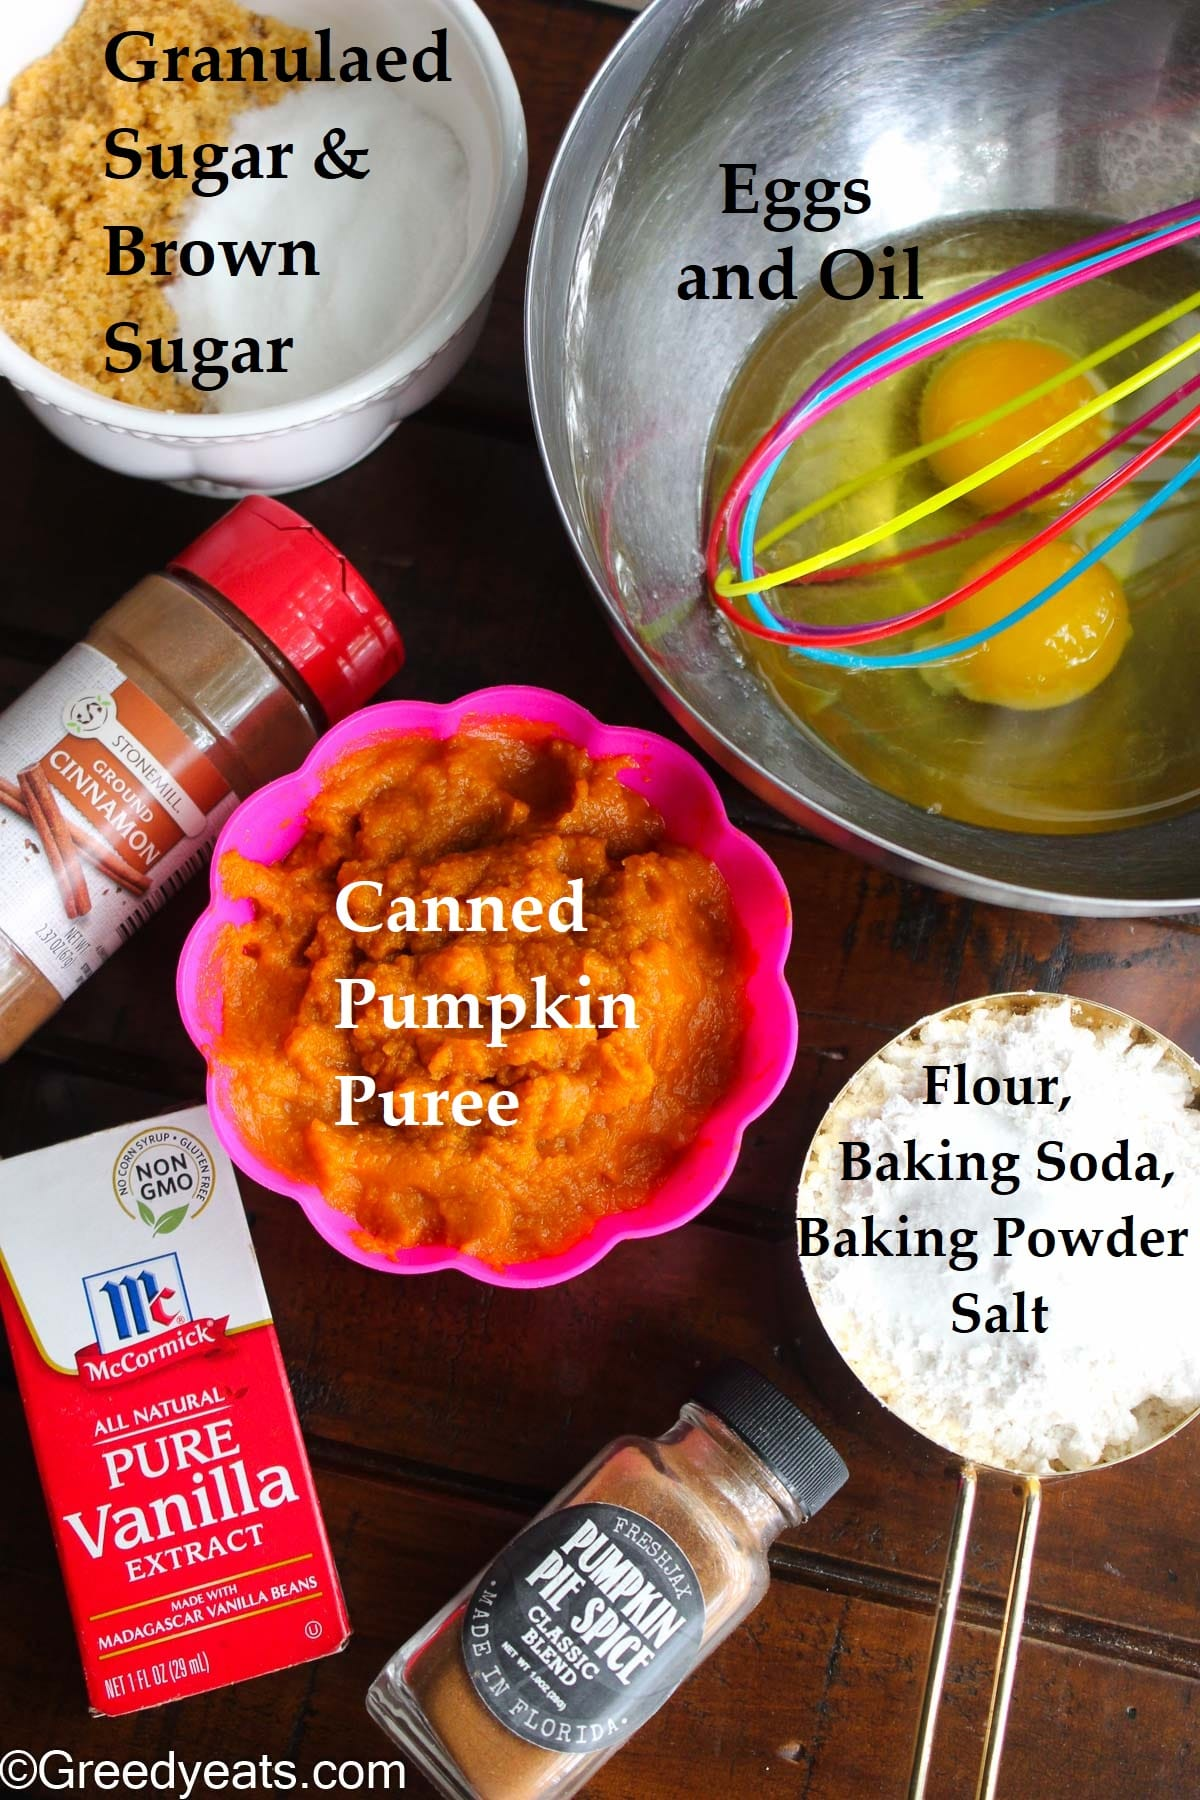 Ingredients like canned pumpkin, brown sugar, eggs, flour and oil used to make Pumpkin Cake.